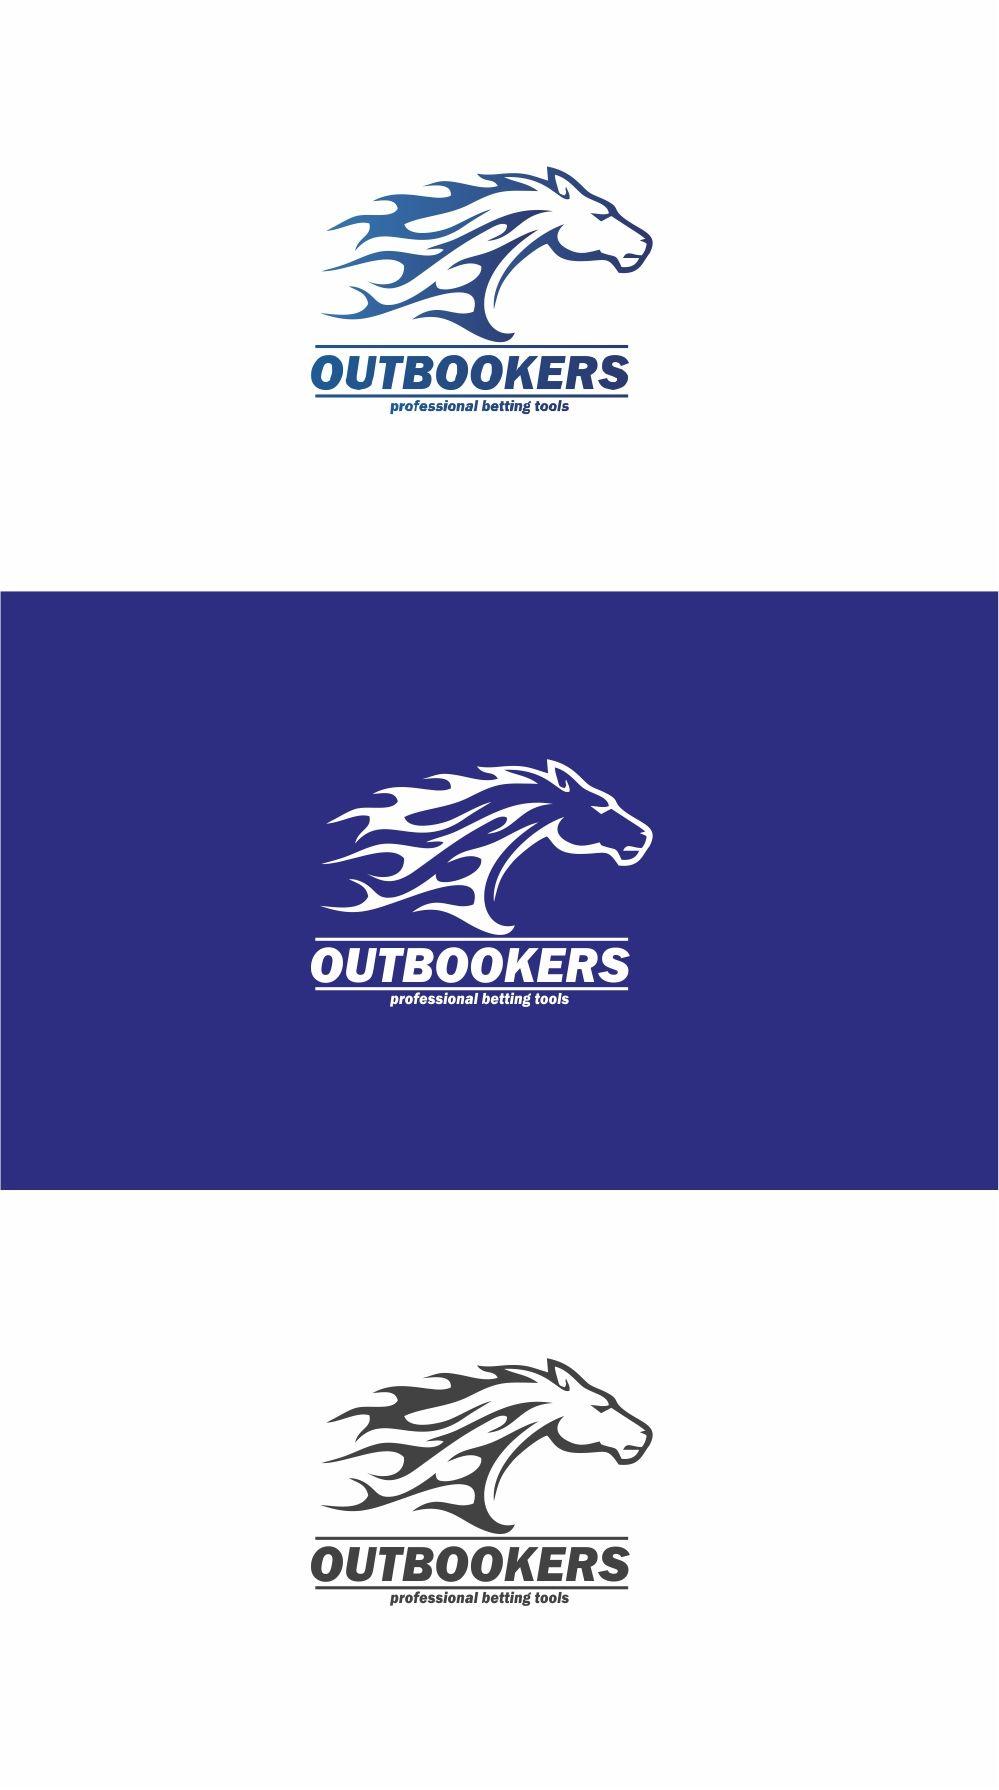 Образ лошади в логотипе (спортивная аналитика) - дизайнер Zarapin17